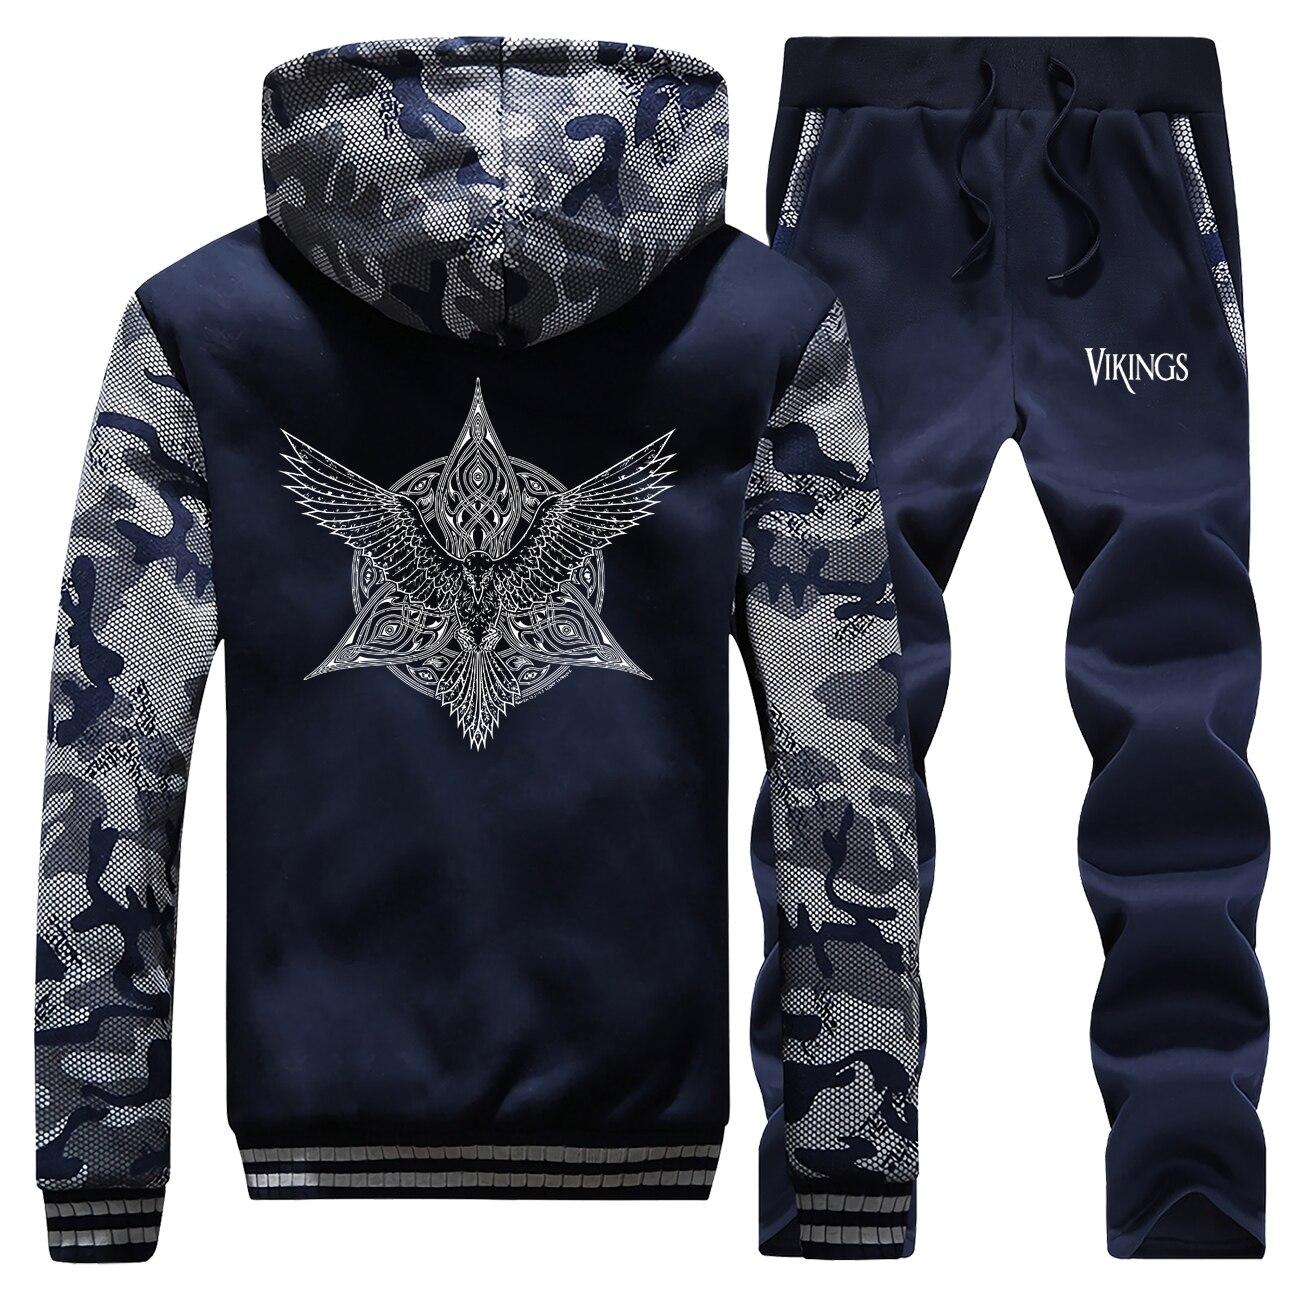 The Viking Camo Male Set Ragnar Odin Print Men's Thick Sets Vikings Fleece Sportsman Wear Sweatsuit Norsemen Pants Sweatshirt